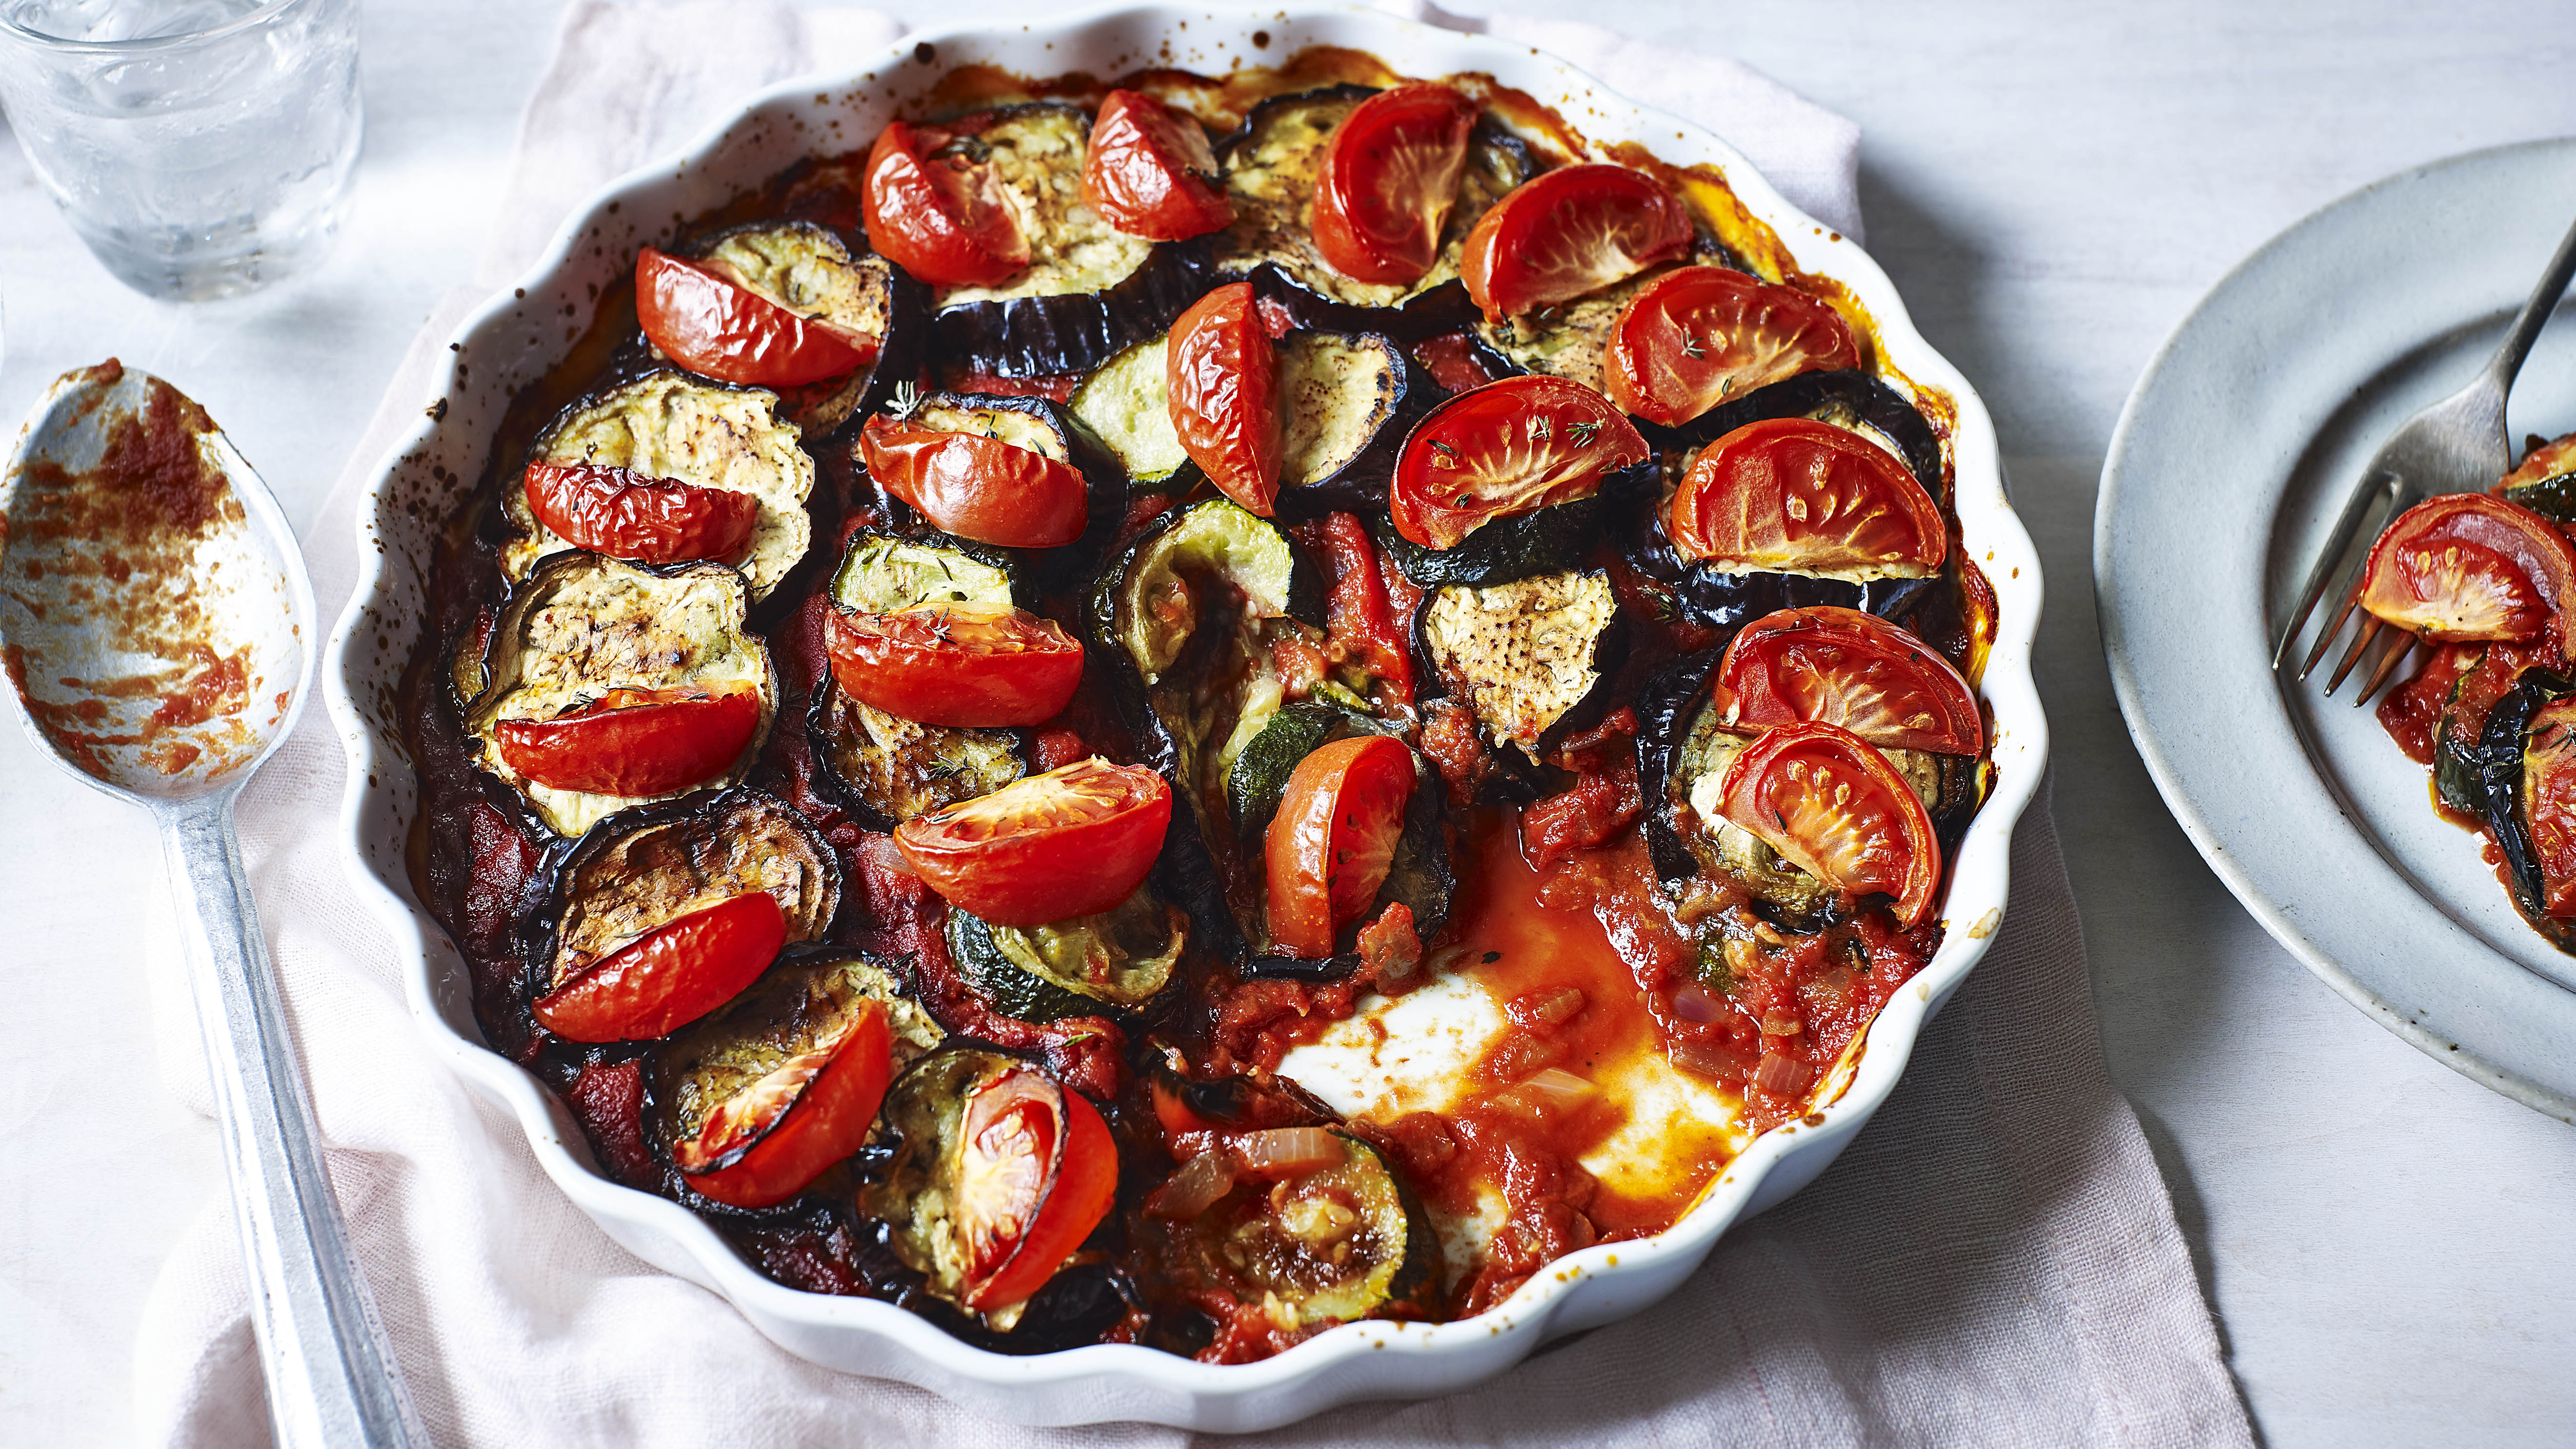 Posh roasted vegetables recipe bbc food forumfinder Gallery